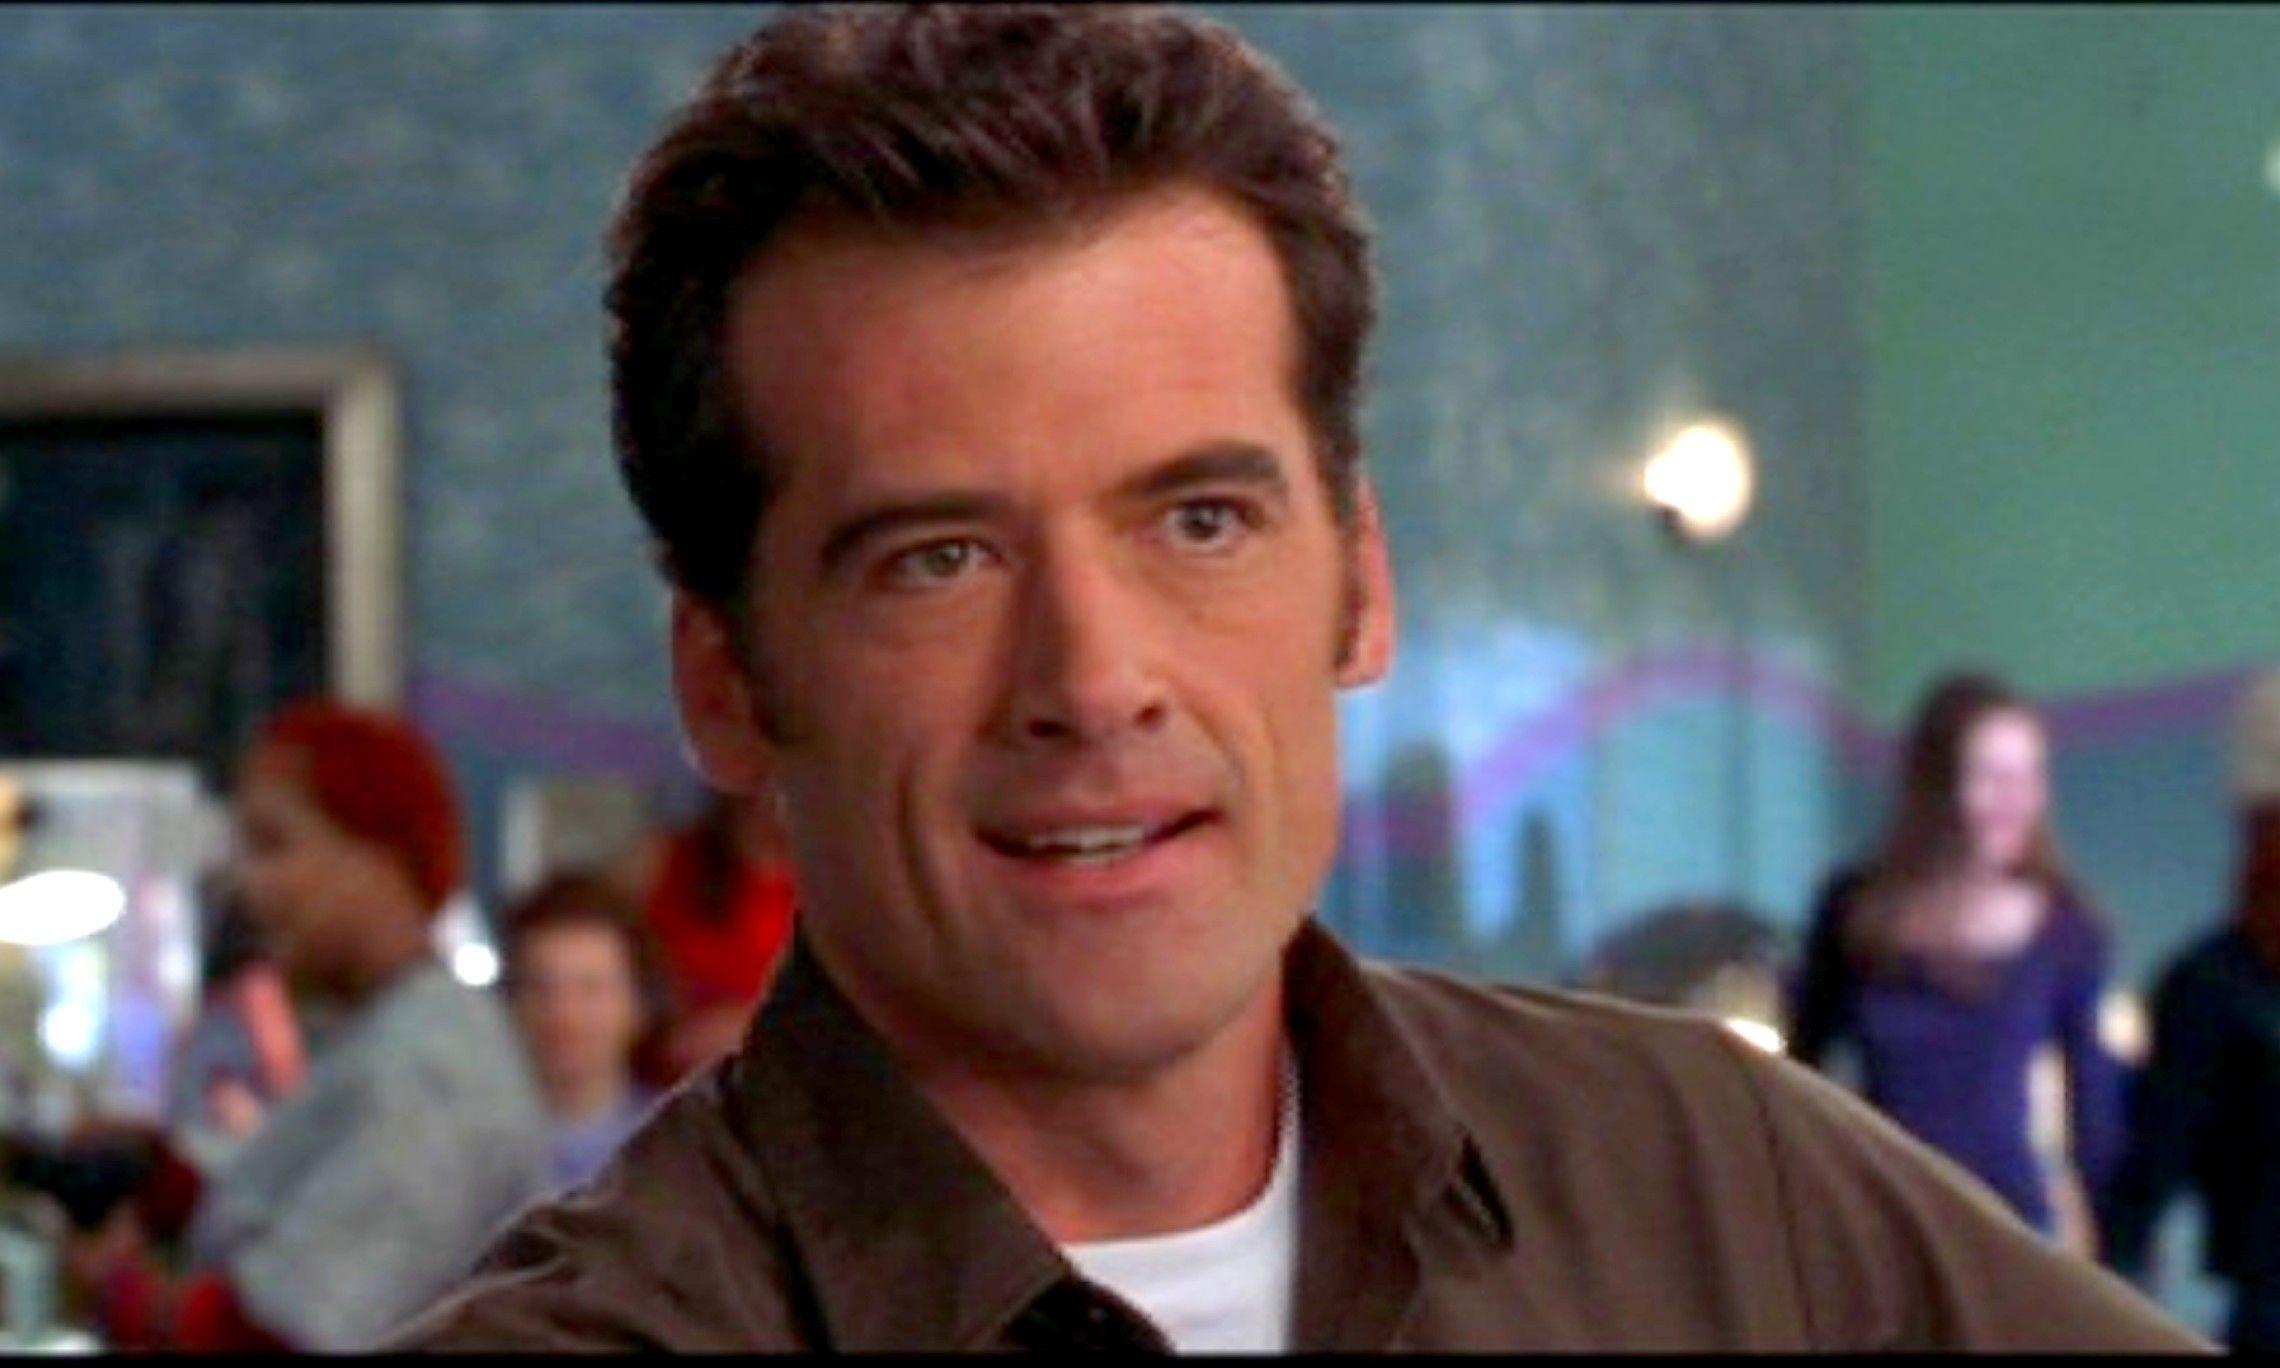 Bruce Thomas | Actors, Handsome, Celebs